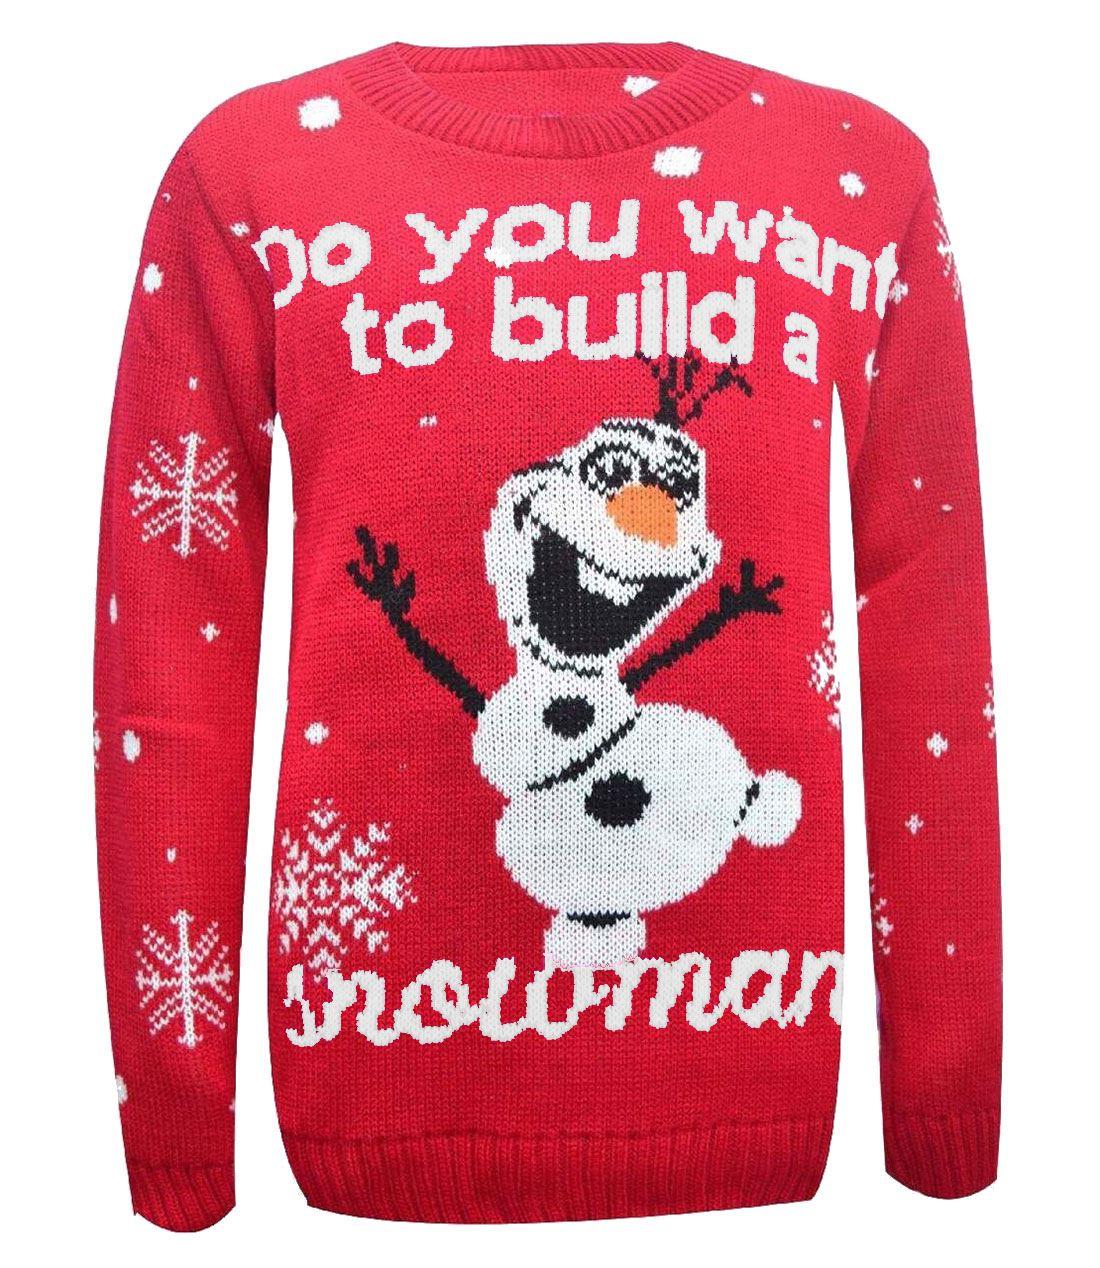 Womens-Long-Sleeve-Snowflake-Knitted-Christmas-Jumper-Kids-Unisex-Winter-Sweater thumbnail 4